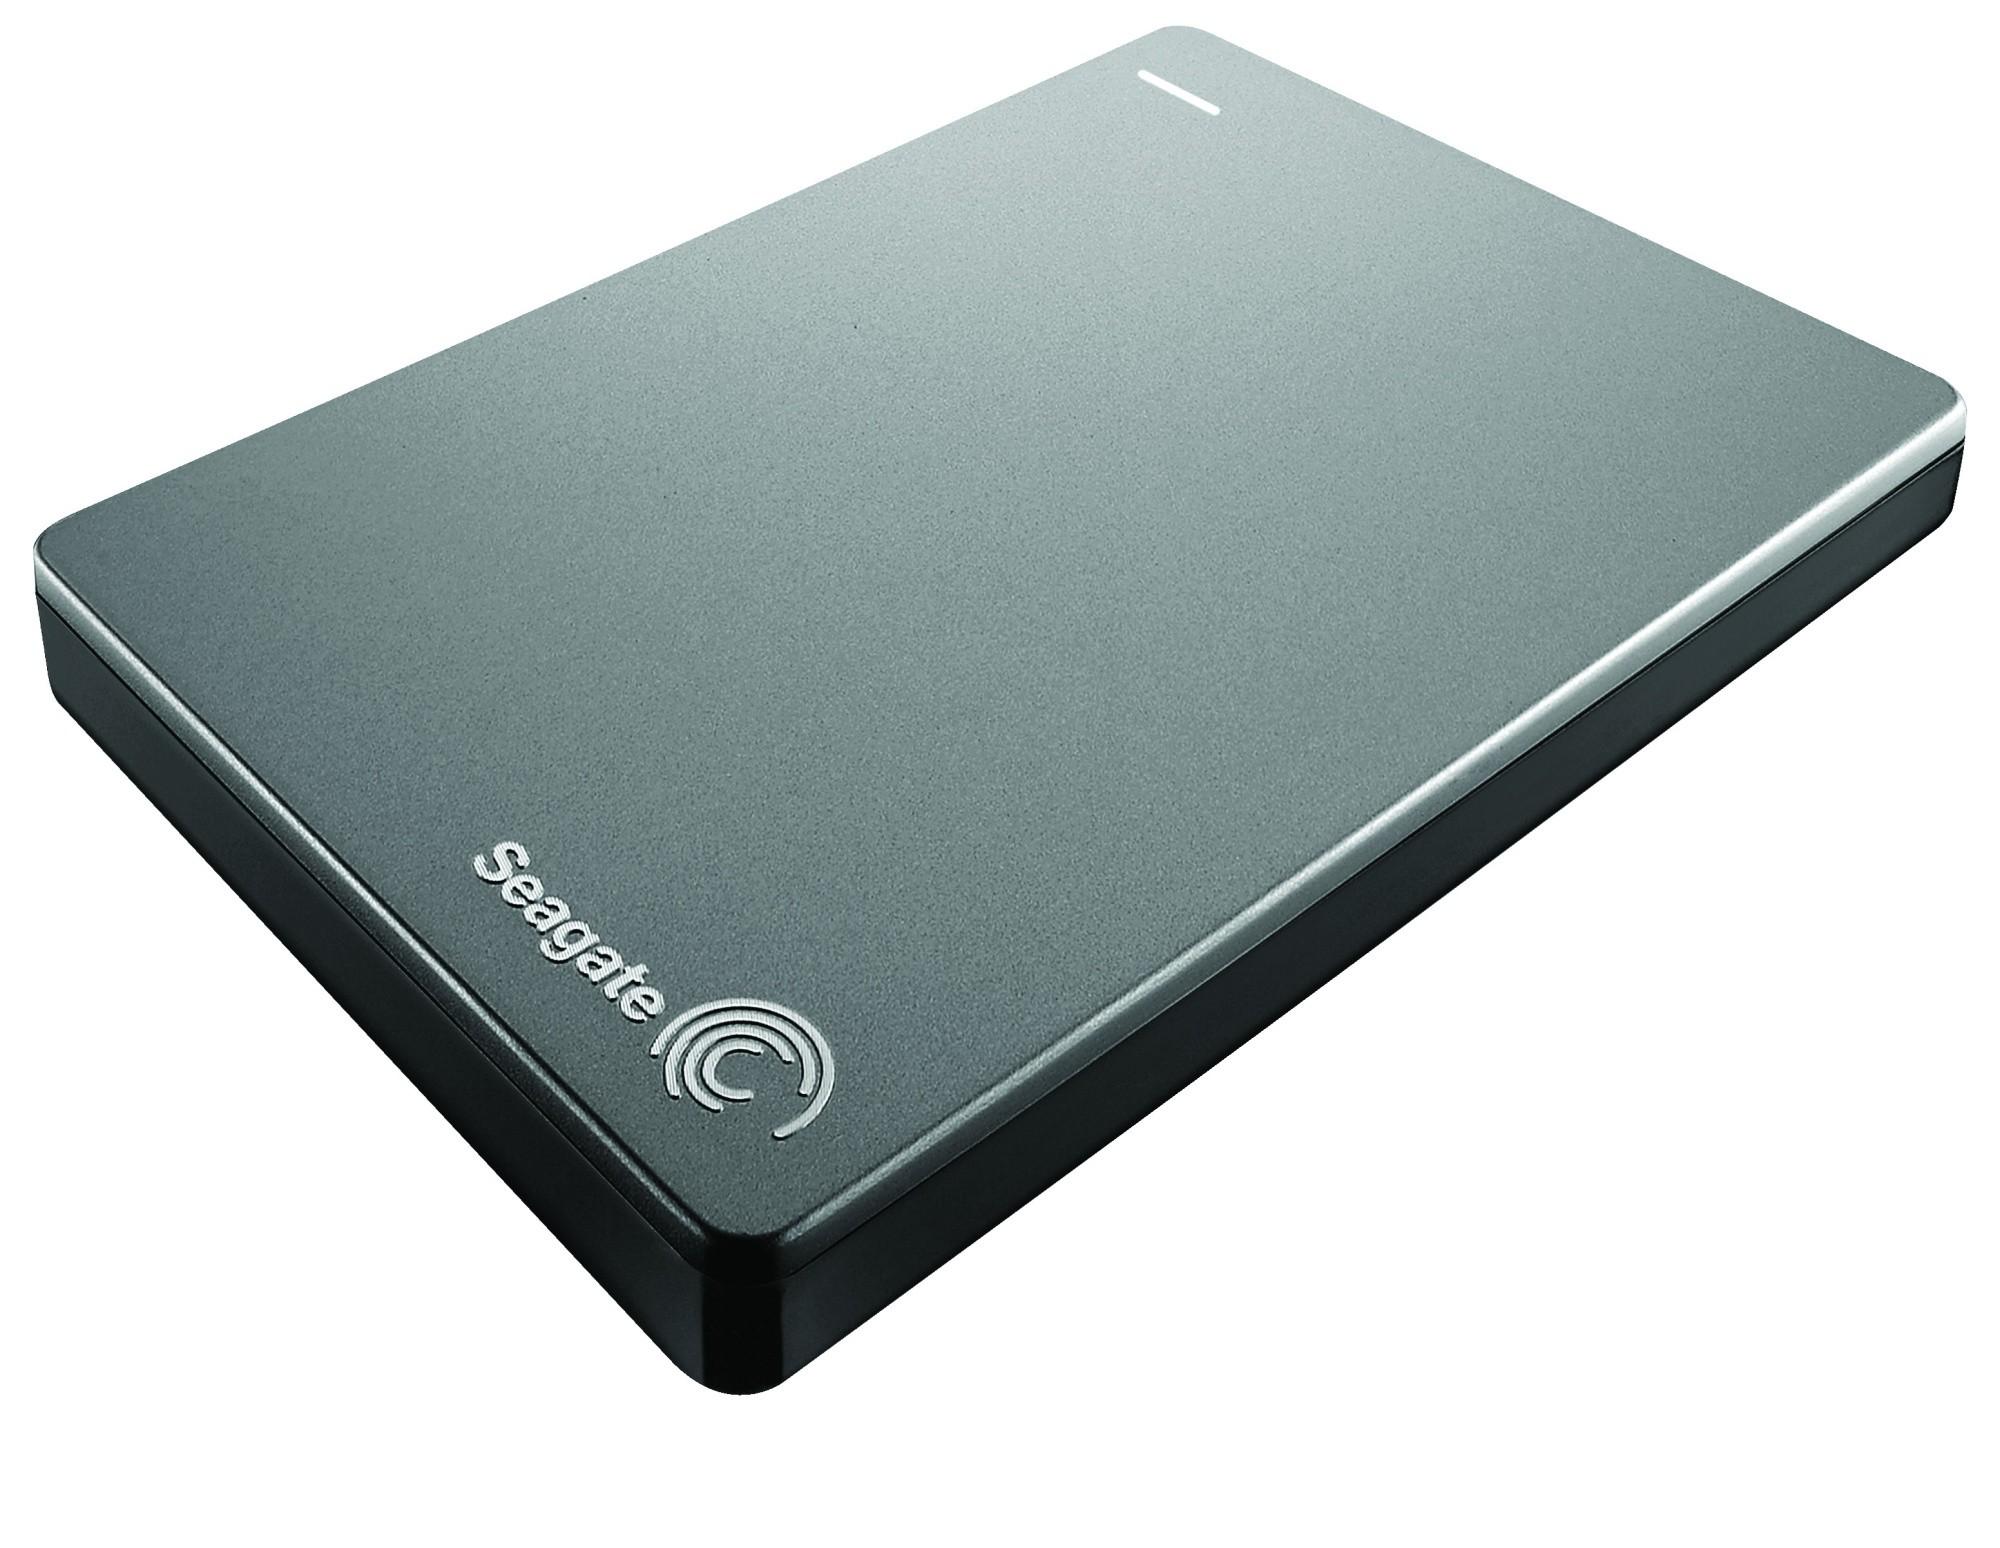 Seagate 1TB Backup Plus Portable External USB 30 Hard